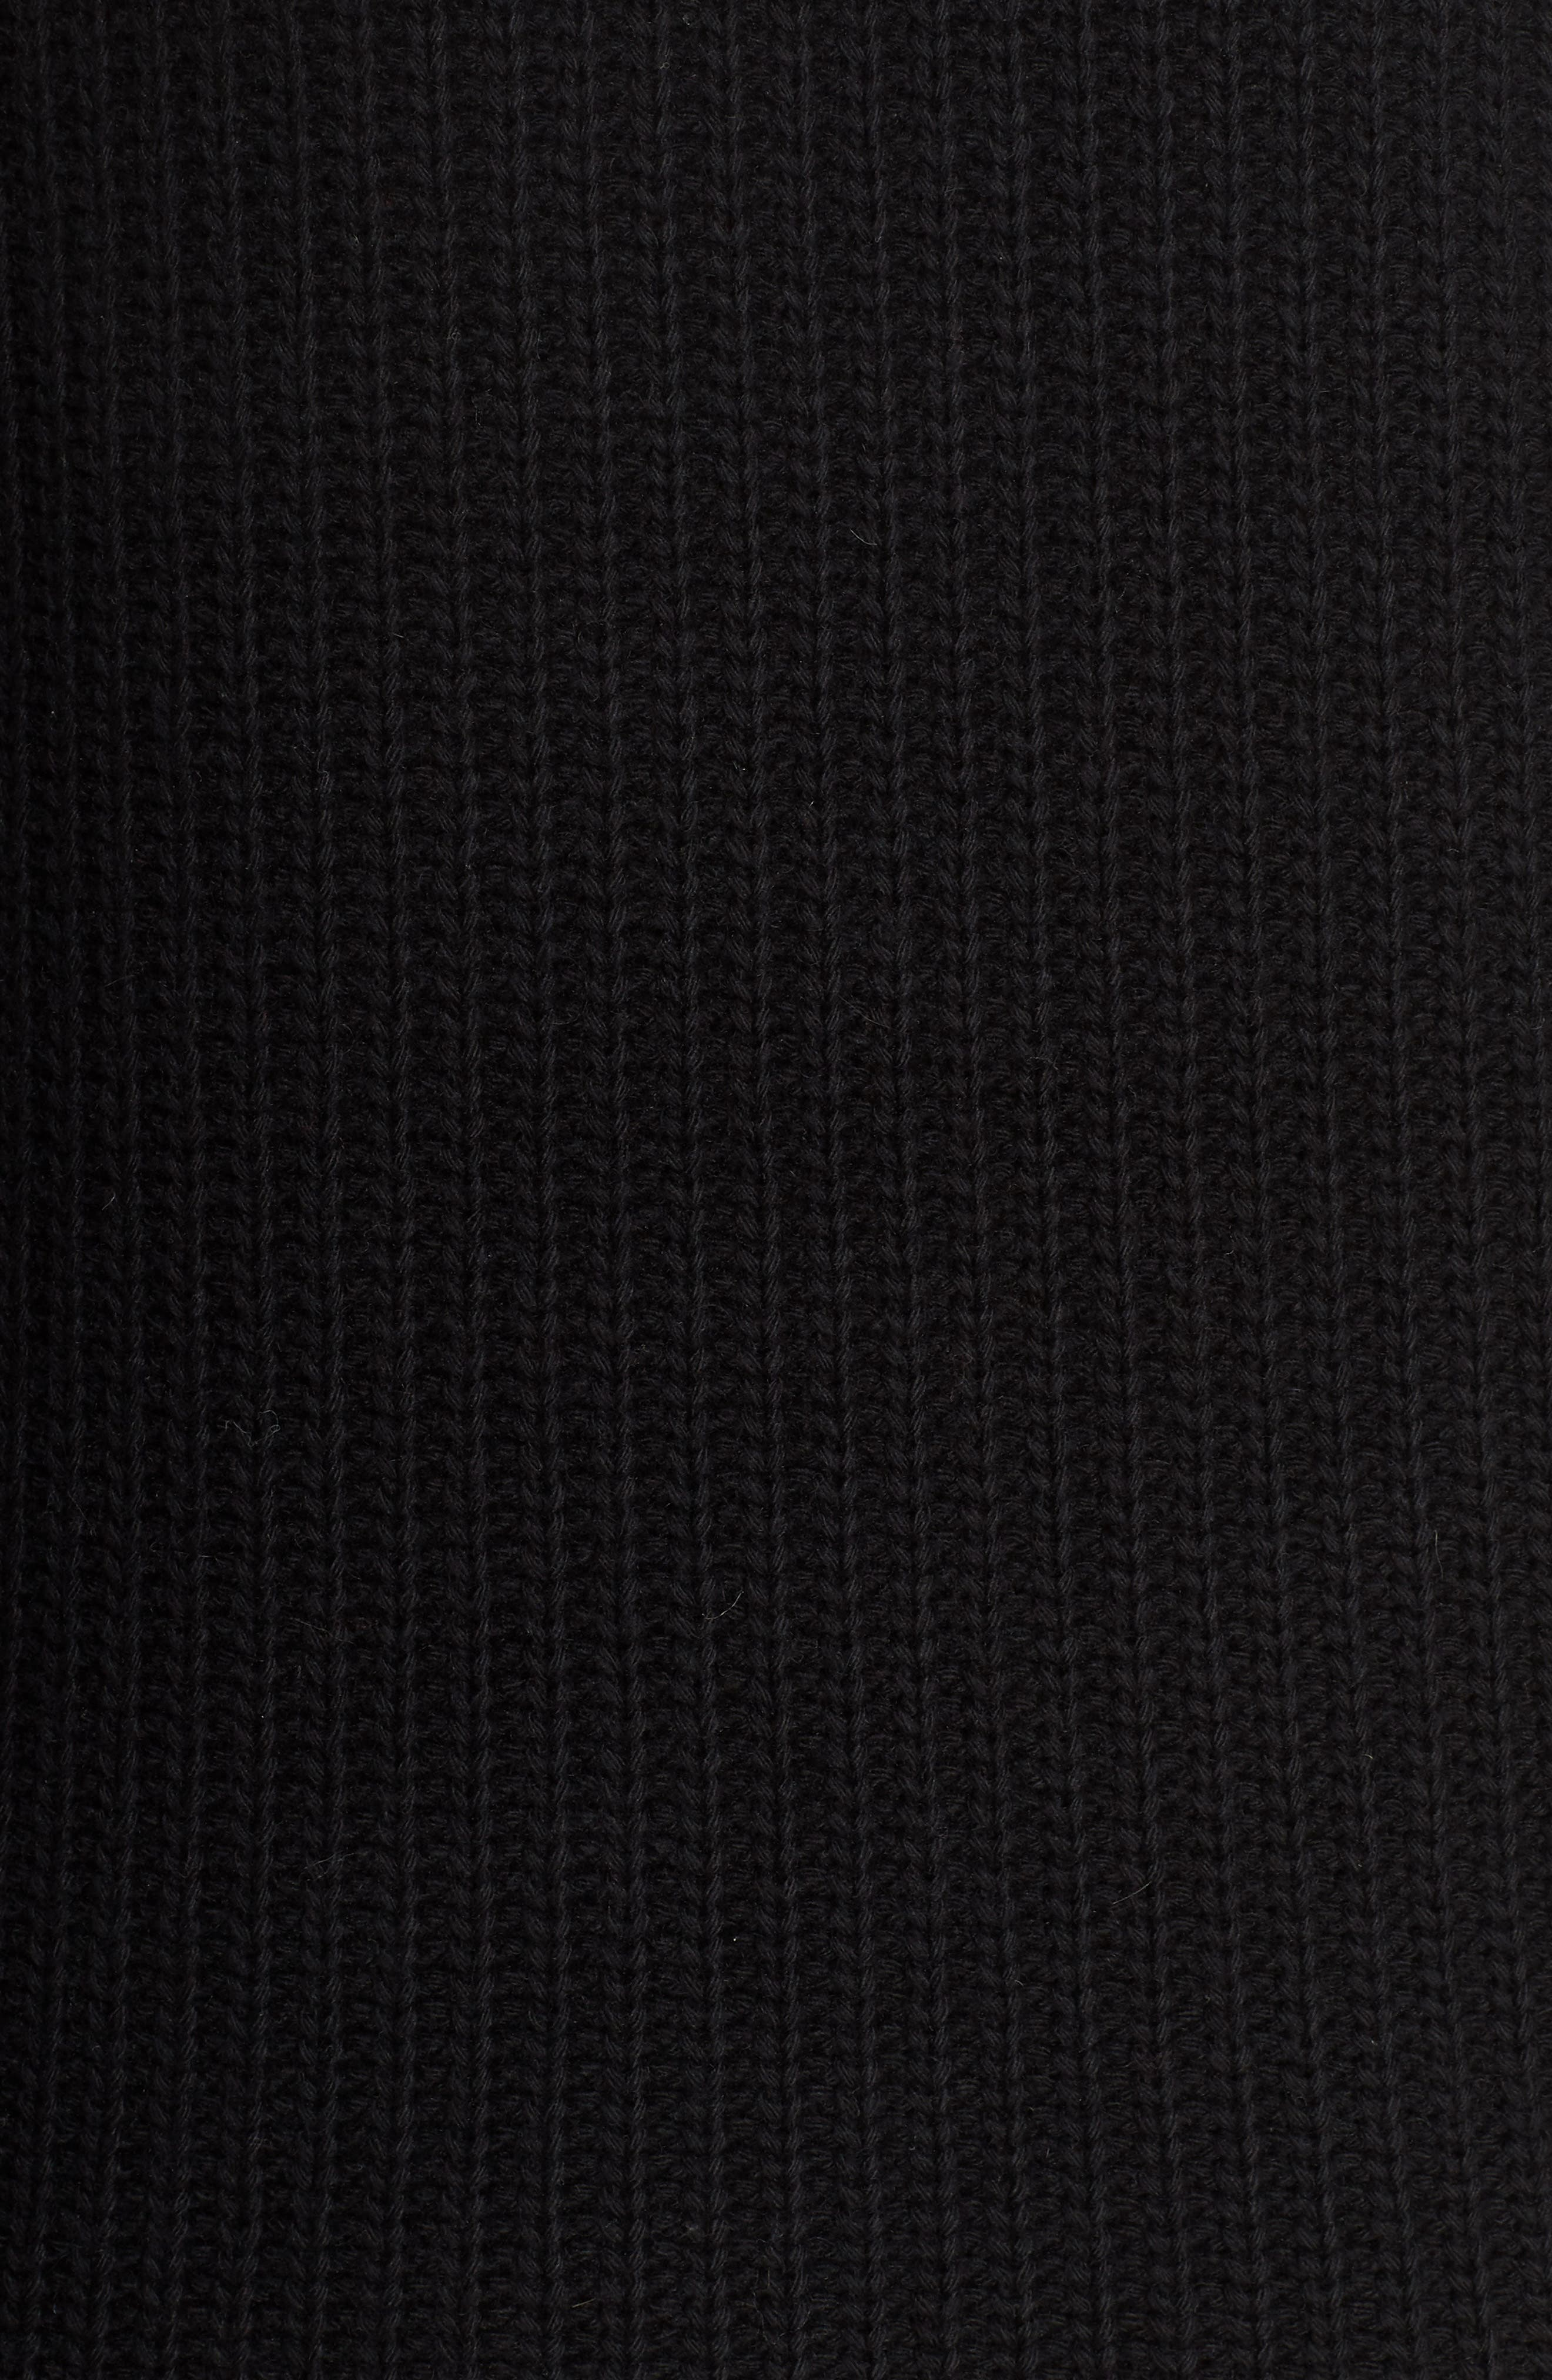 Ceanne Turtleneck Sweater,                             Alternate thumbnail 5, color,                             001